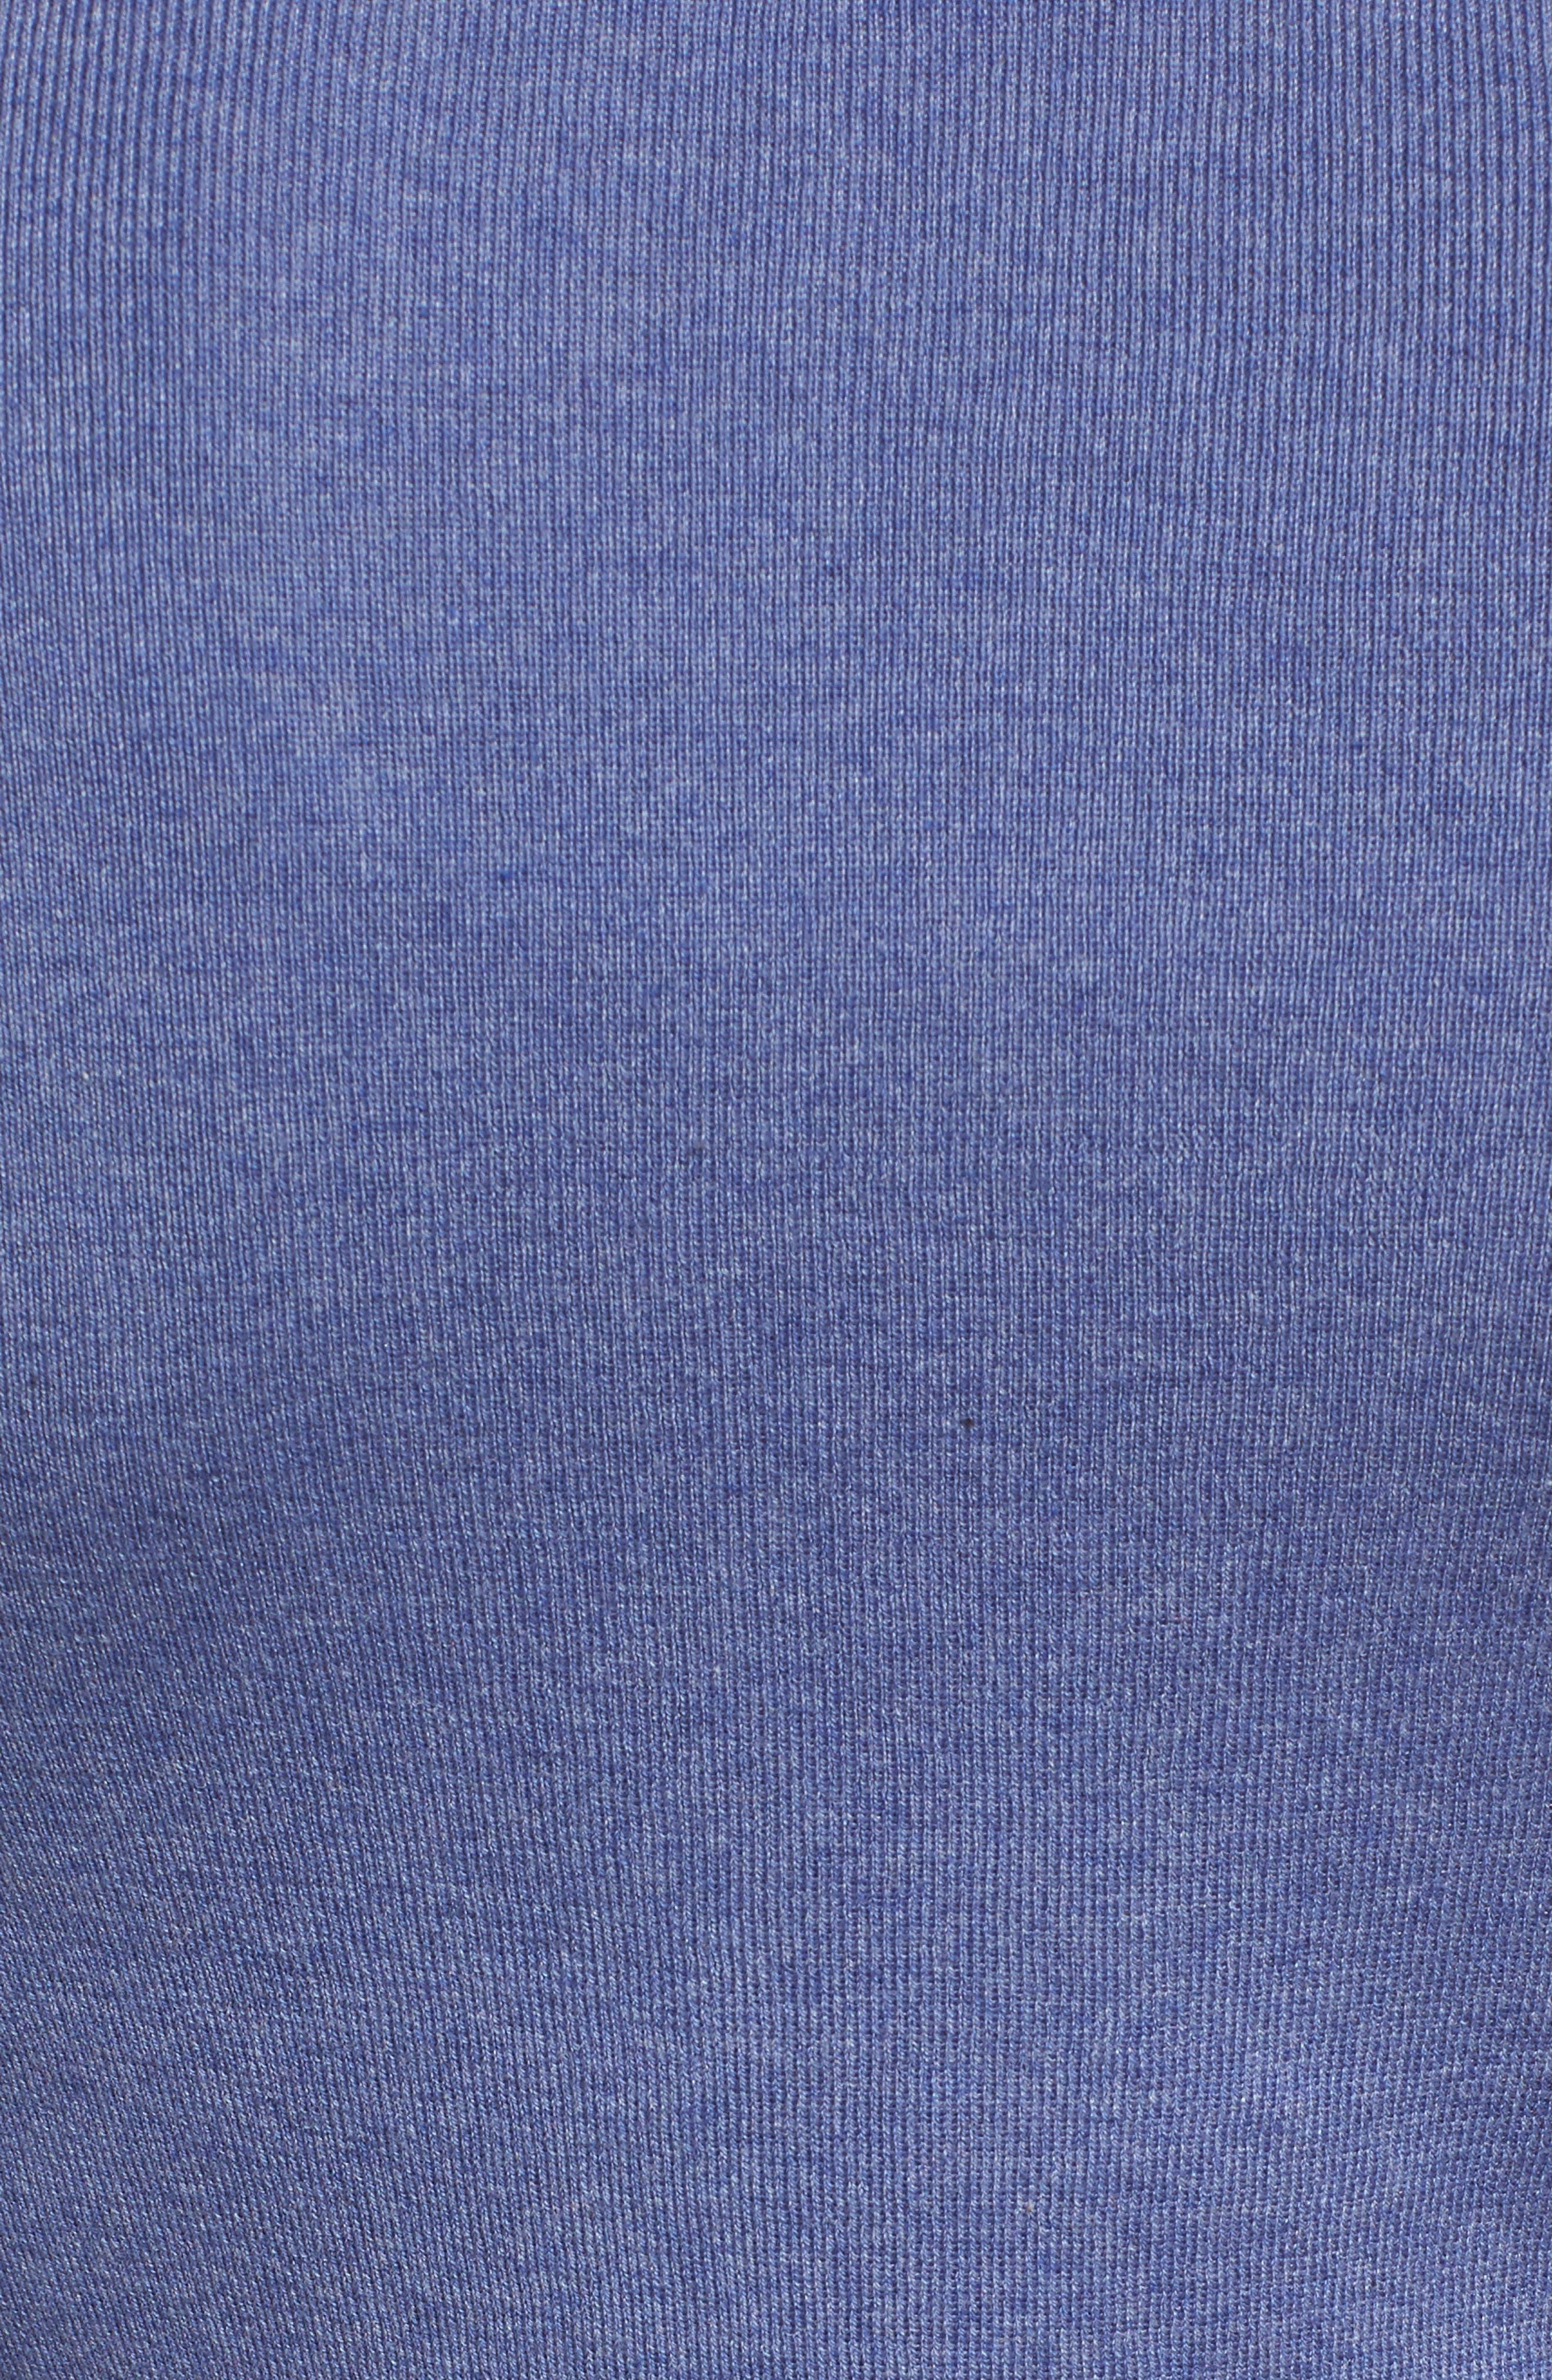 4-Way Convertible Lightweight Cardigan,                             Alternate thumbnail 347, color,